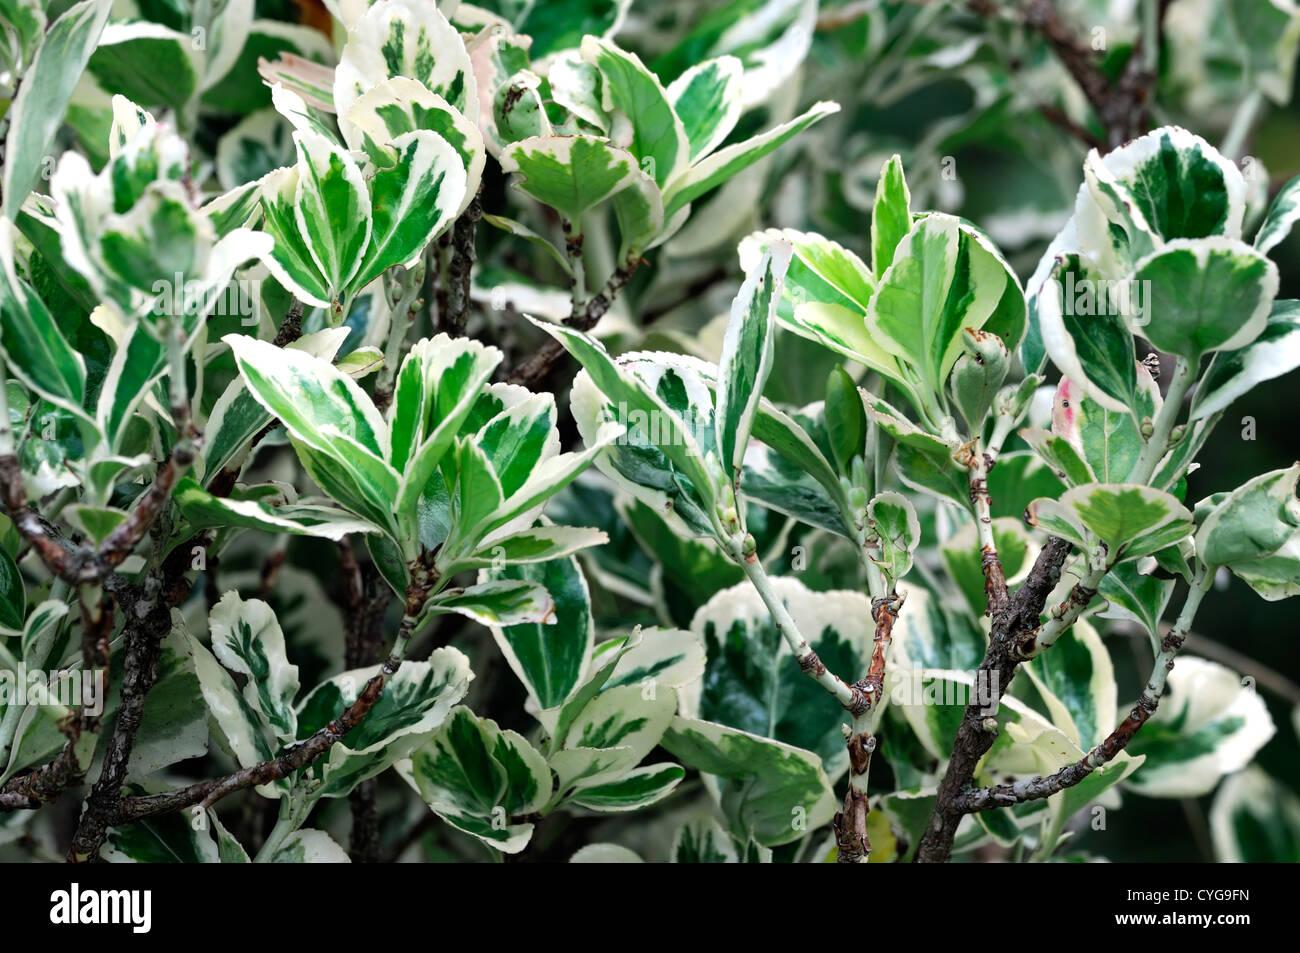 "variegated leaves Sasaella masamuneana ""albostrlata"", dwarf variegated bamboo, 3, 7, 62  euonymus microphylla variegata, dwarf variegated boxleaf, 8, 12, 652."